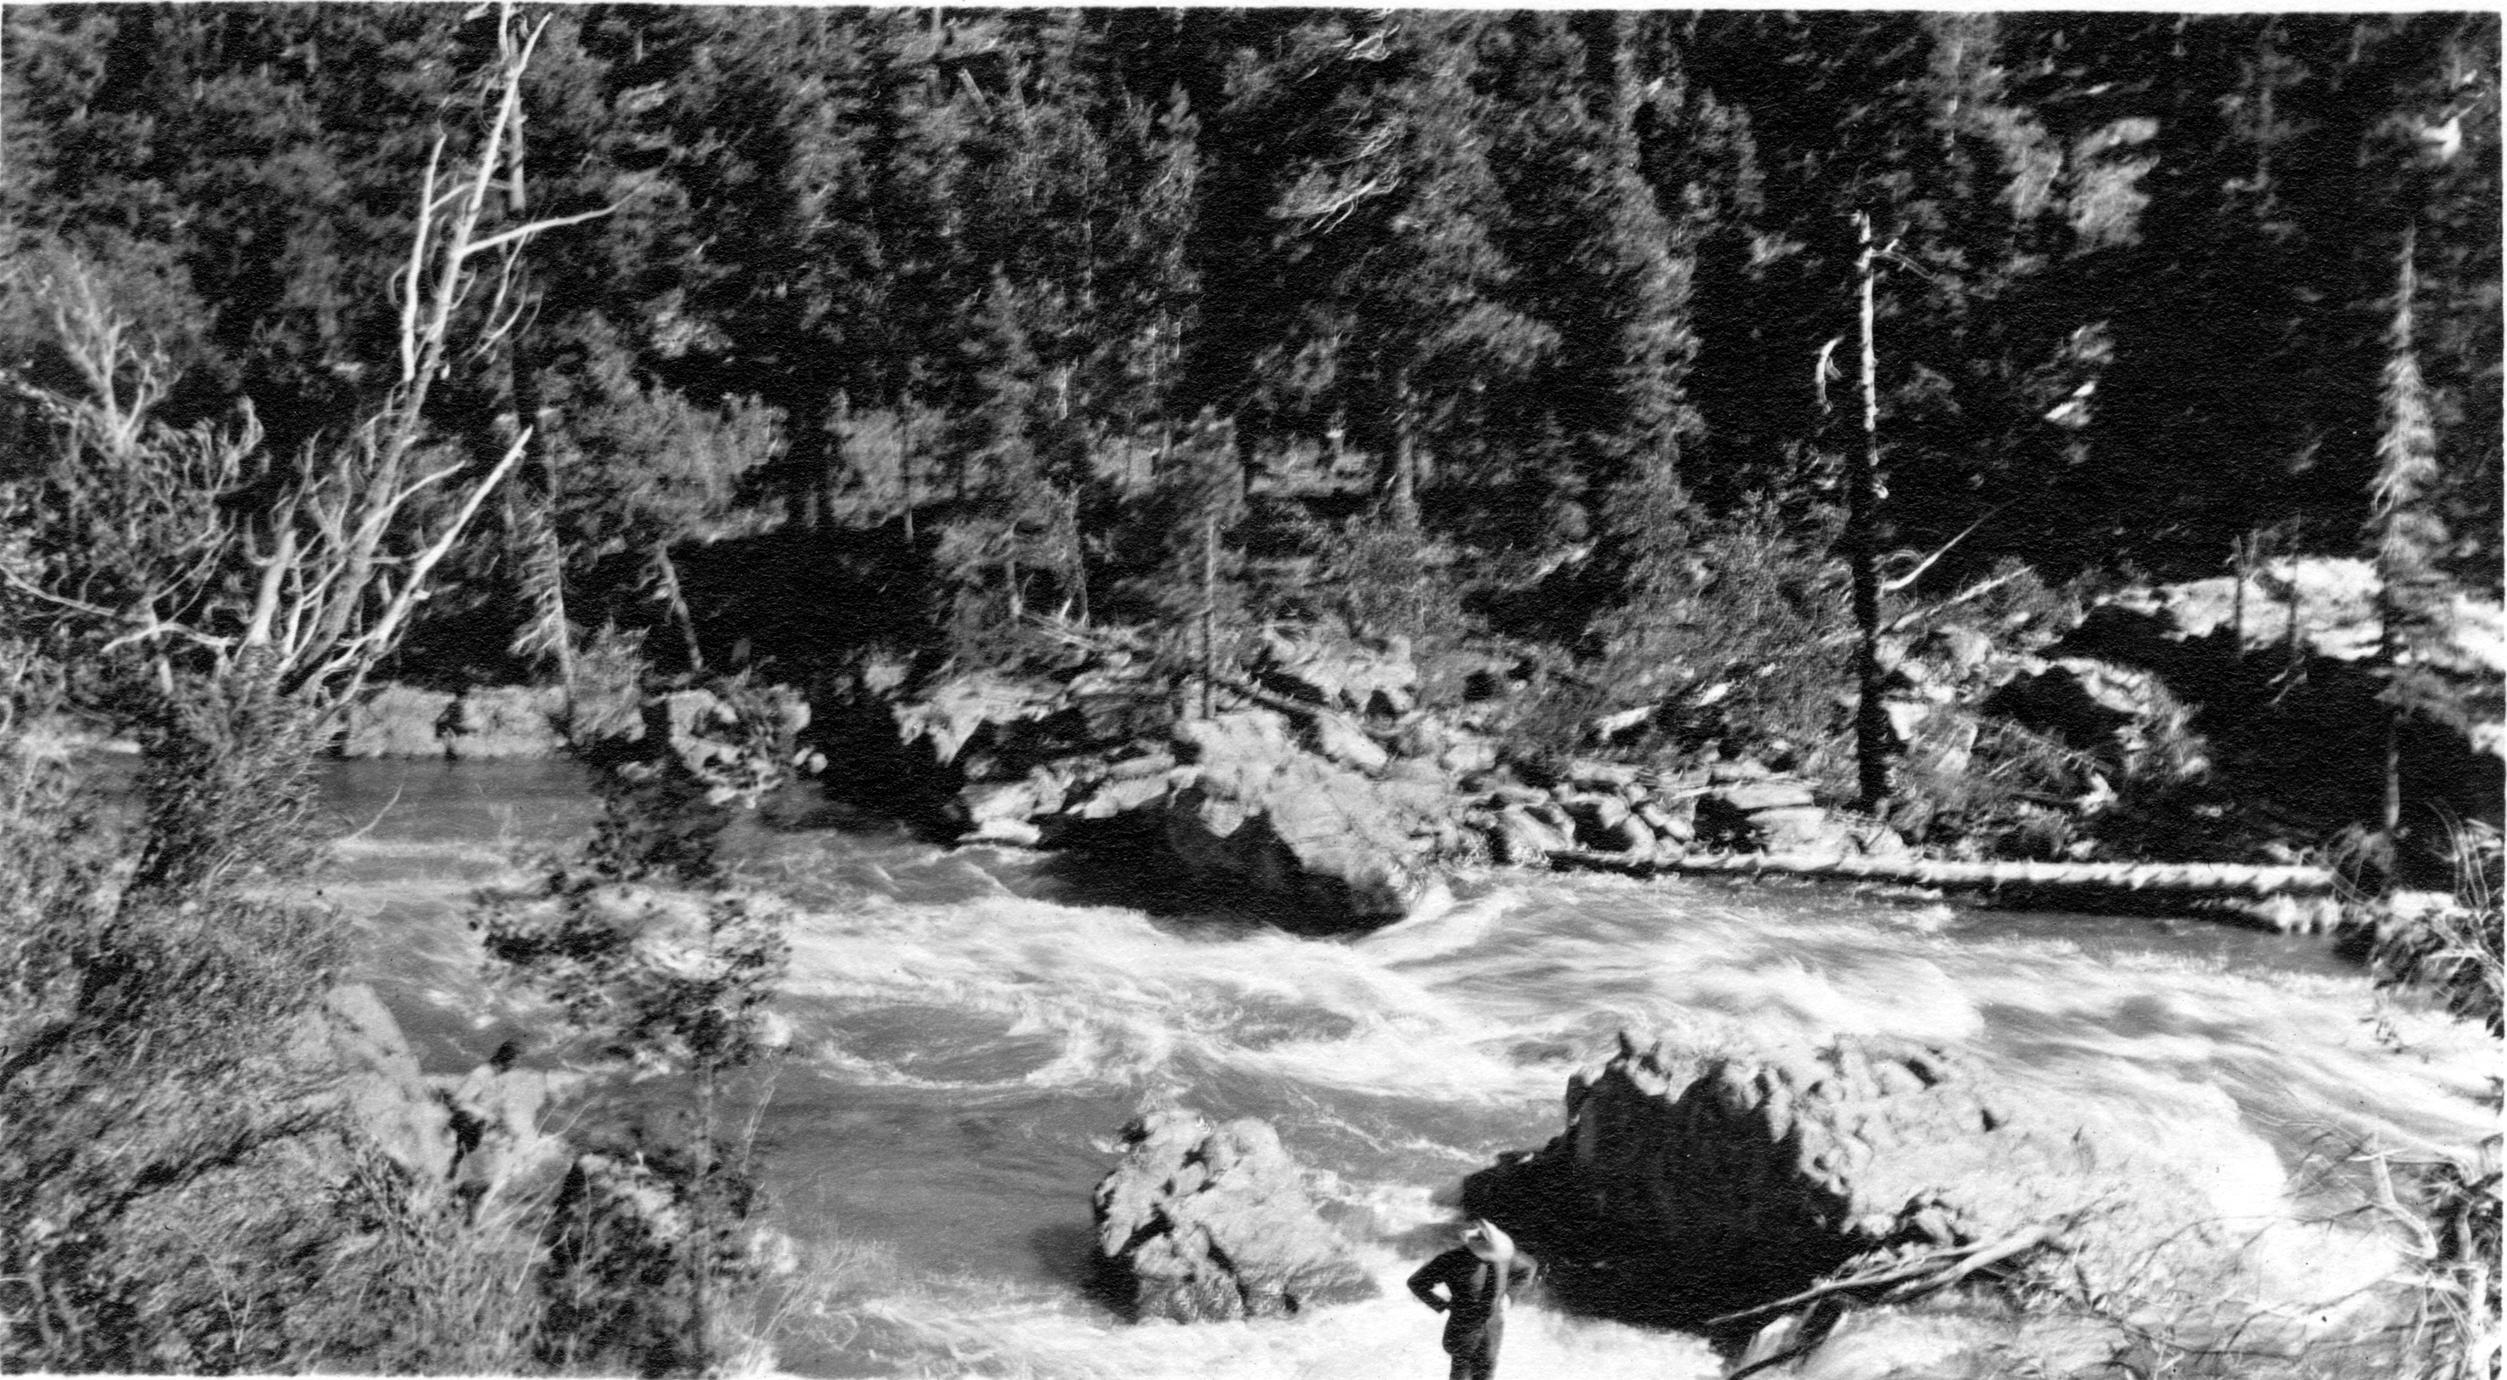 Man standing at river rapids